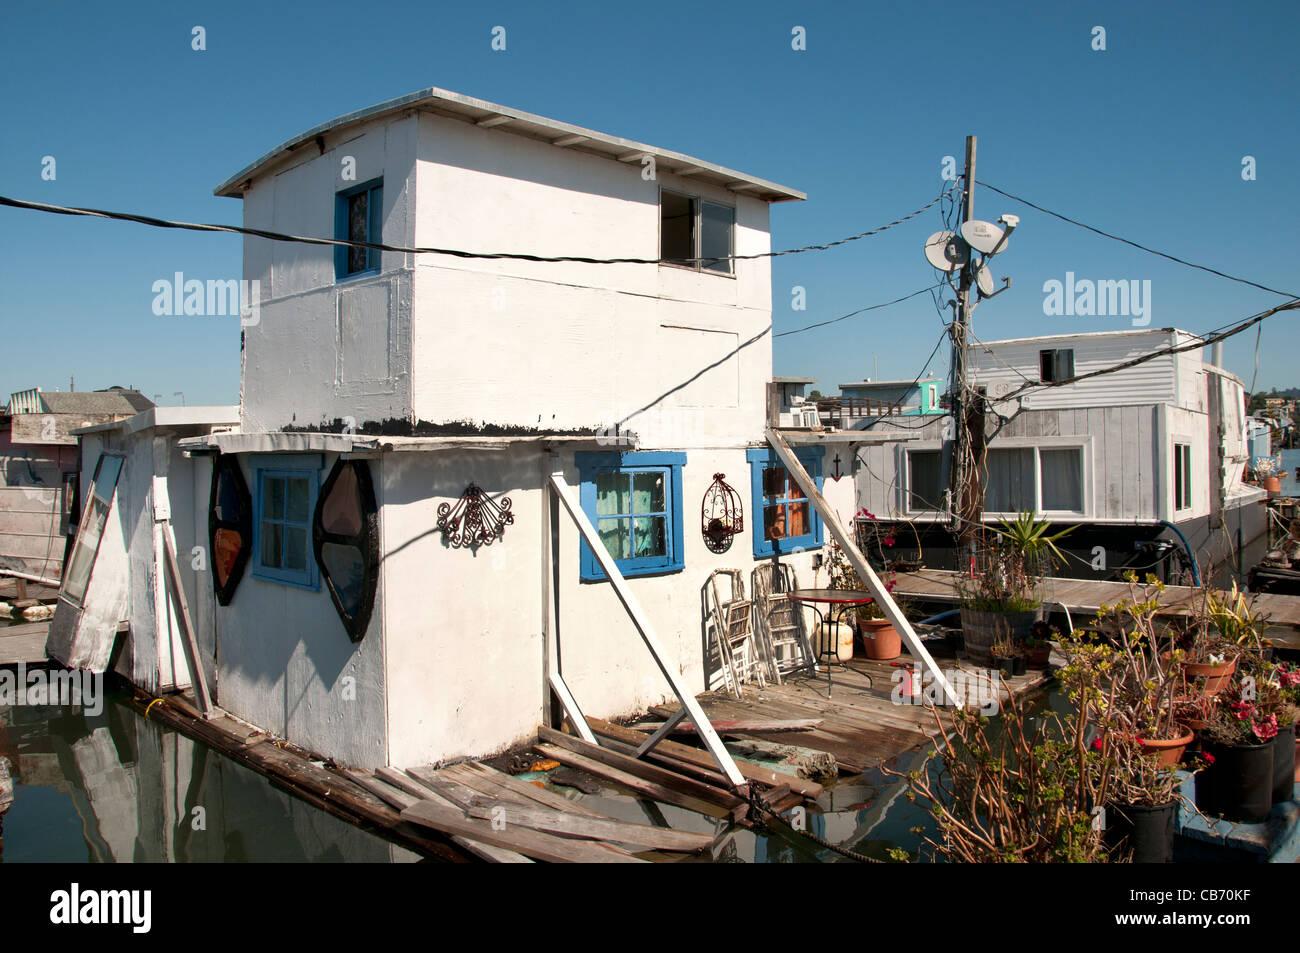 Sausalito's houseboat community San Francisco Bay California United States of America - Stock Image